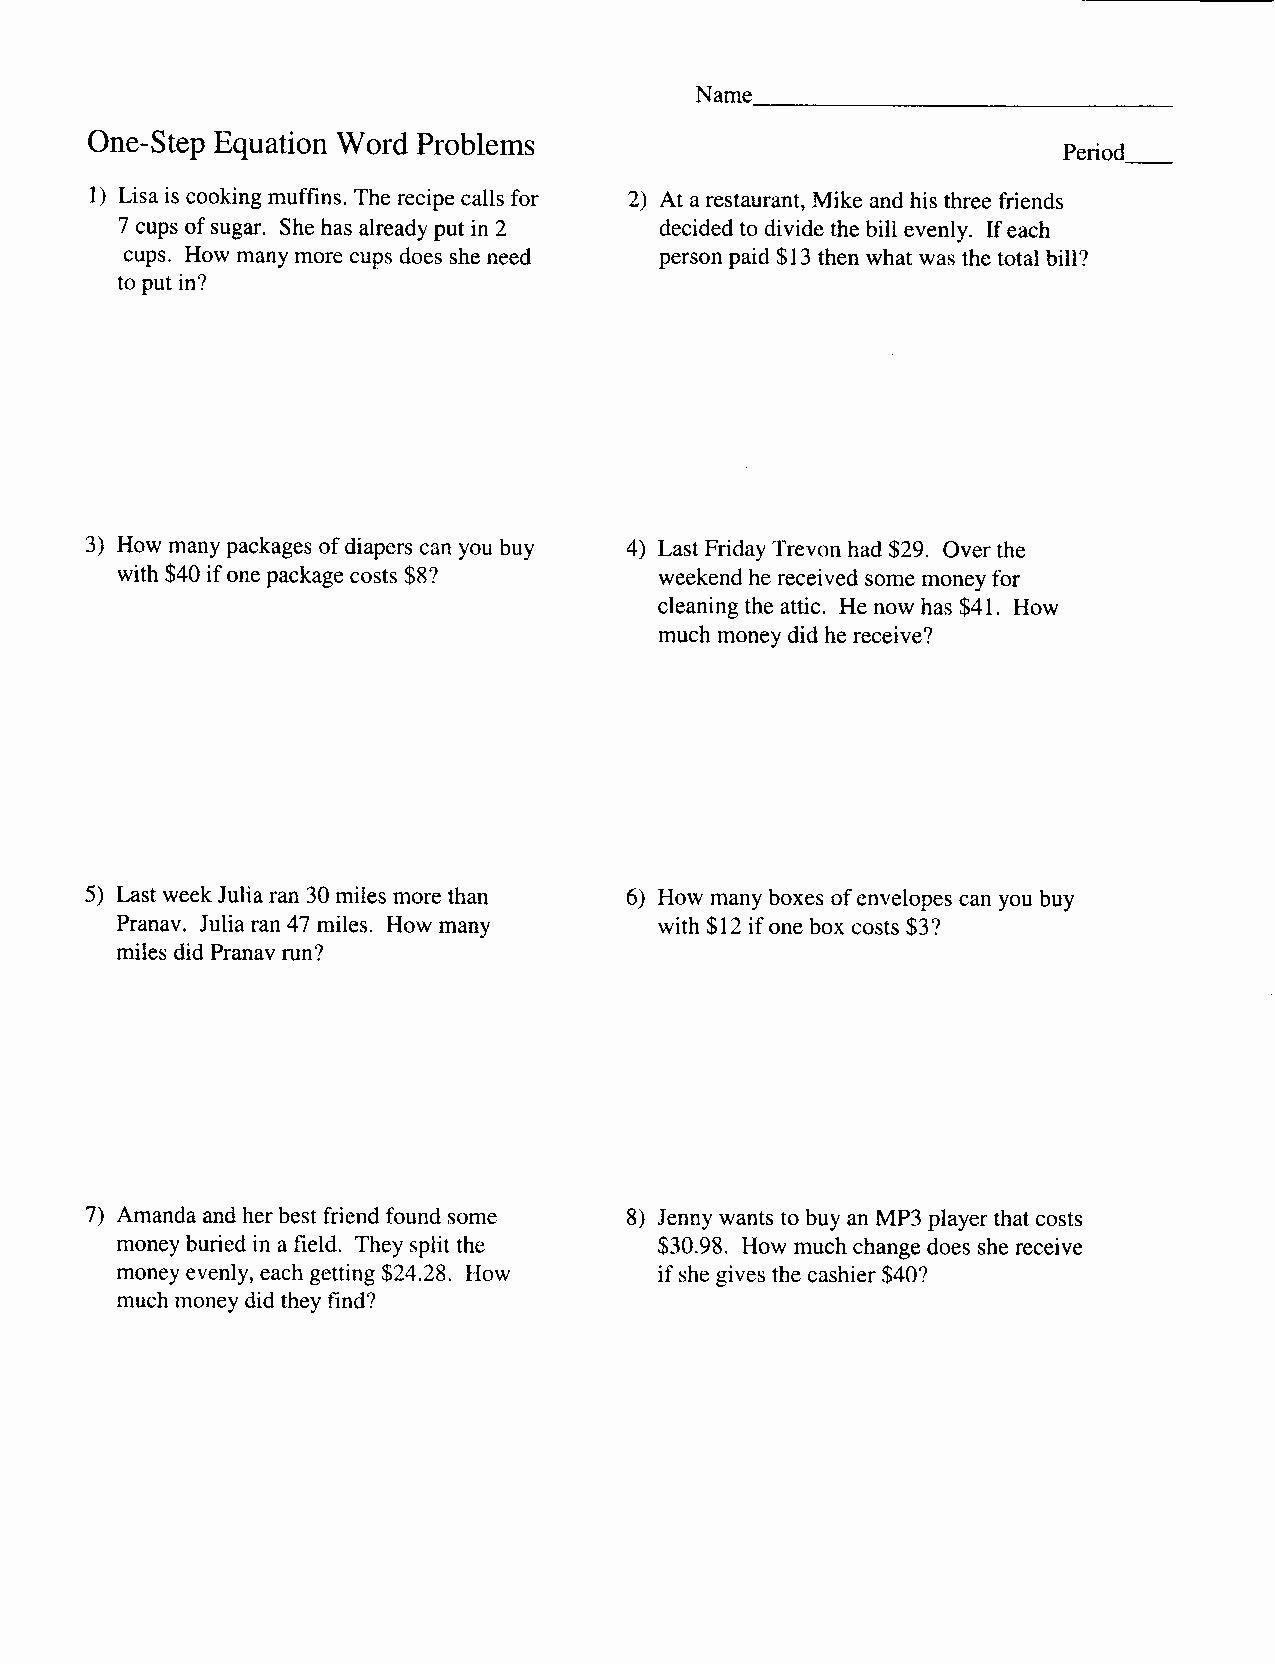 One Step Equations Worksheet Pdf Algebra Word Problems Worksheet Pdf Inspirational Two Step